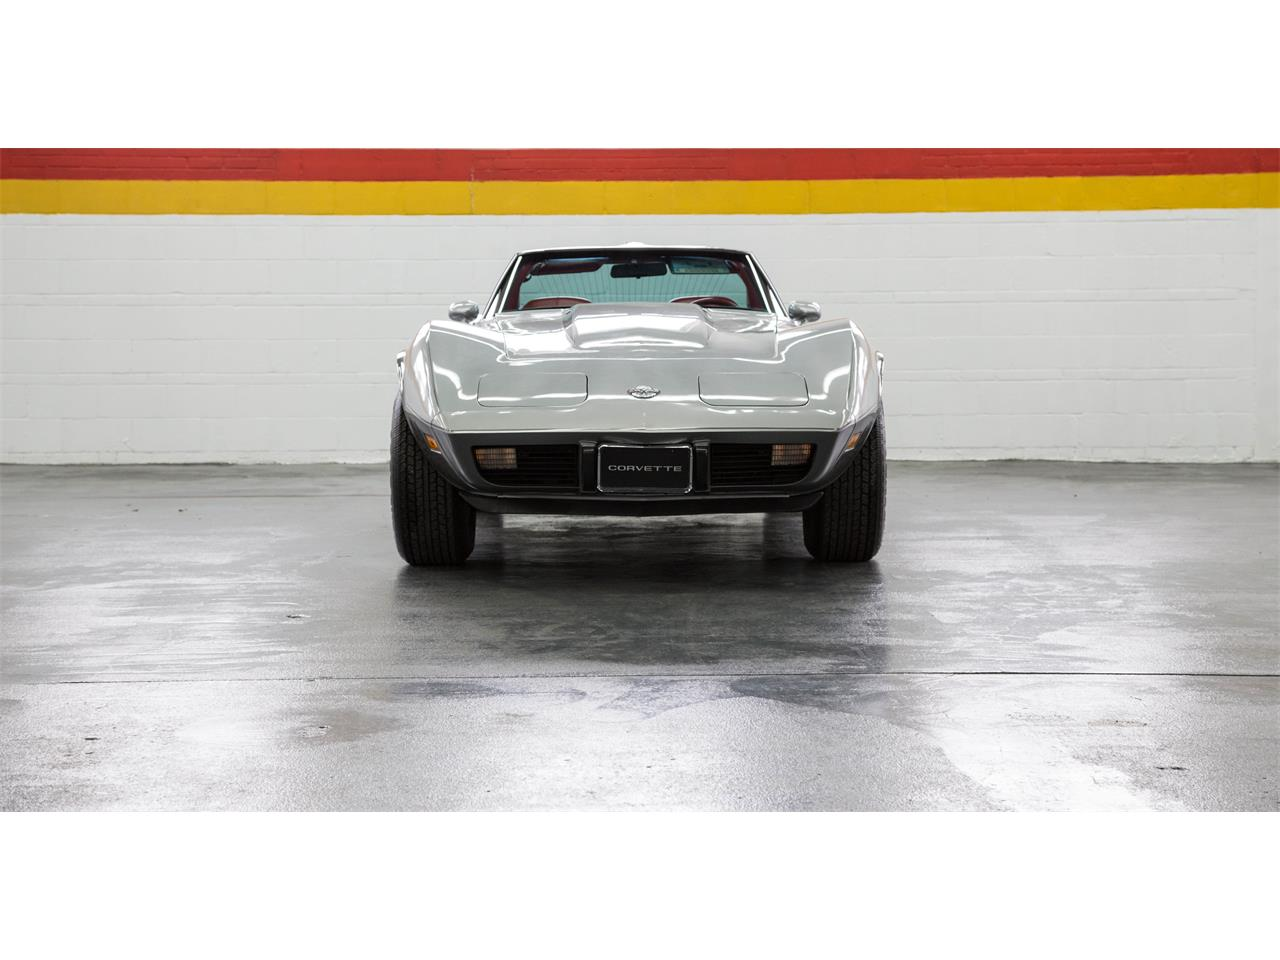 1978 Chevrolet Corvette (CC-1060249) for sale in MONTREAL, Quebec